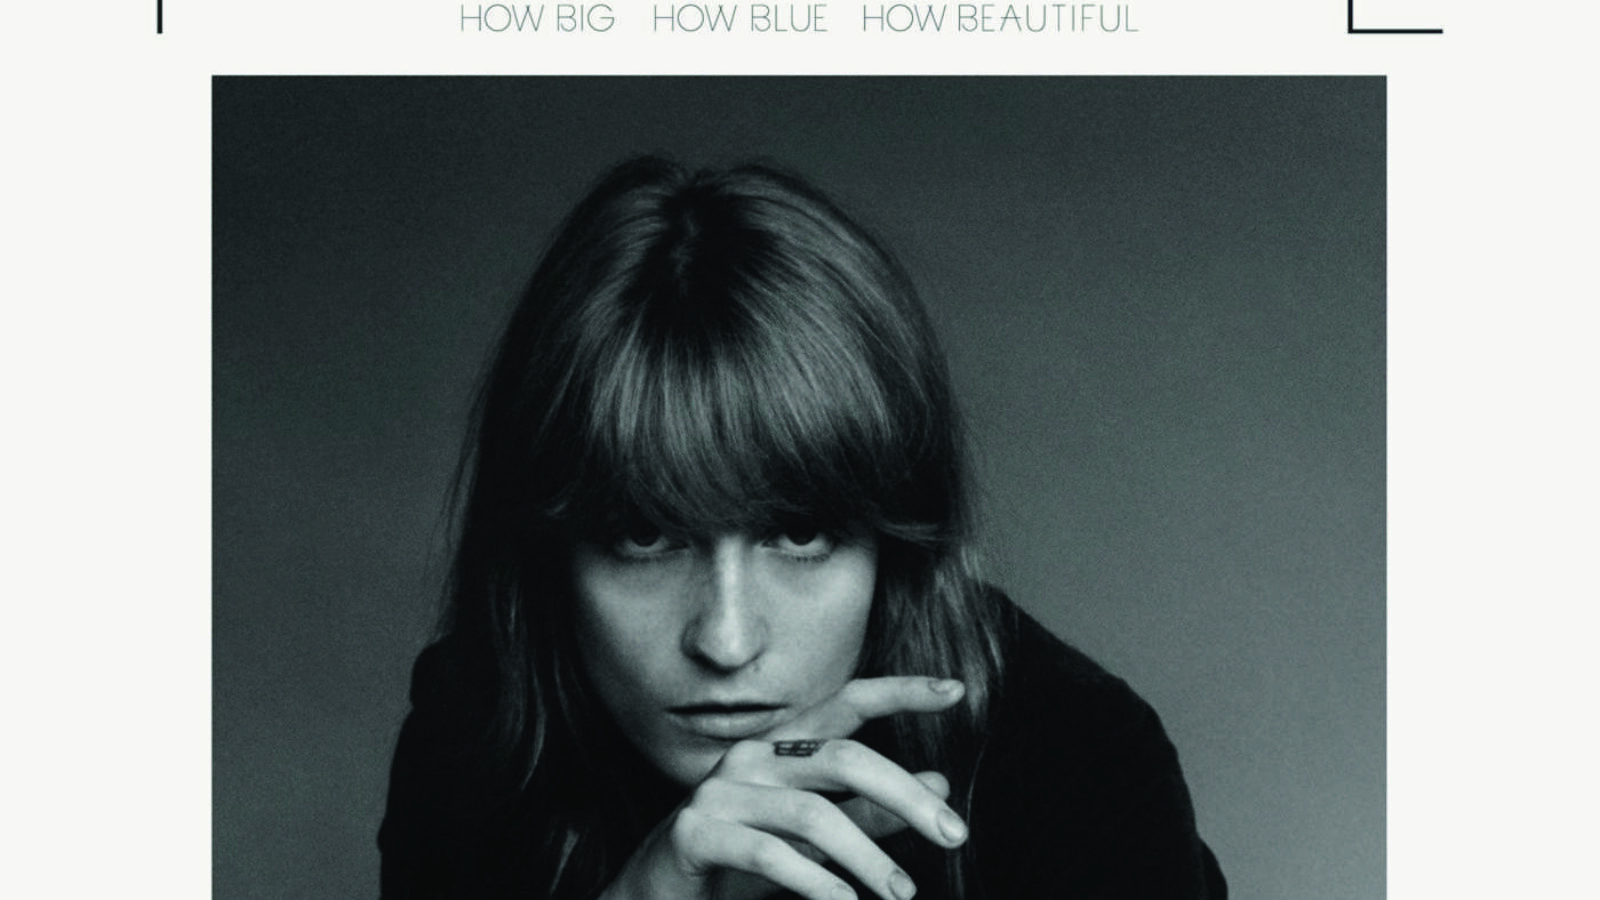 OXMOX CD-Tipp: FLORENCE + THE MACHINE – How Big, How Blue, How Beautiful